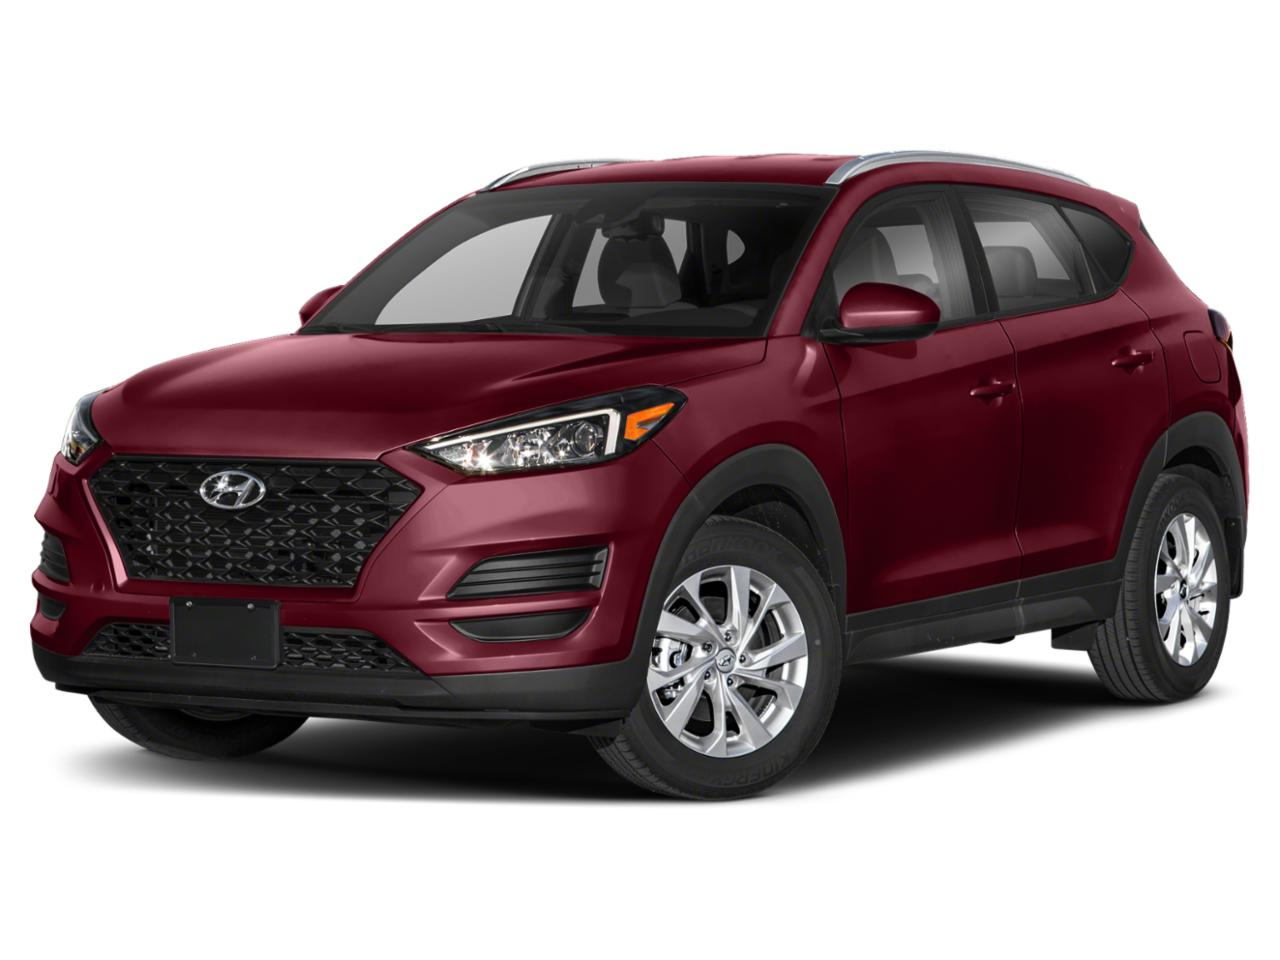 2019 Hyundai Tucson Vehicle Photo in Carlisle, PA 17015